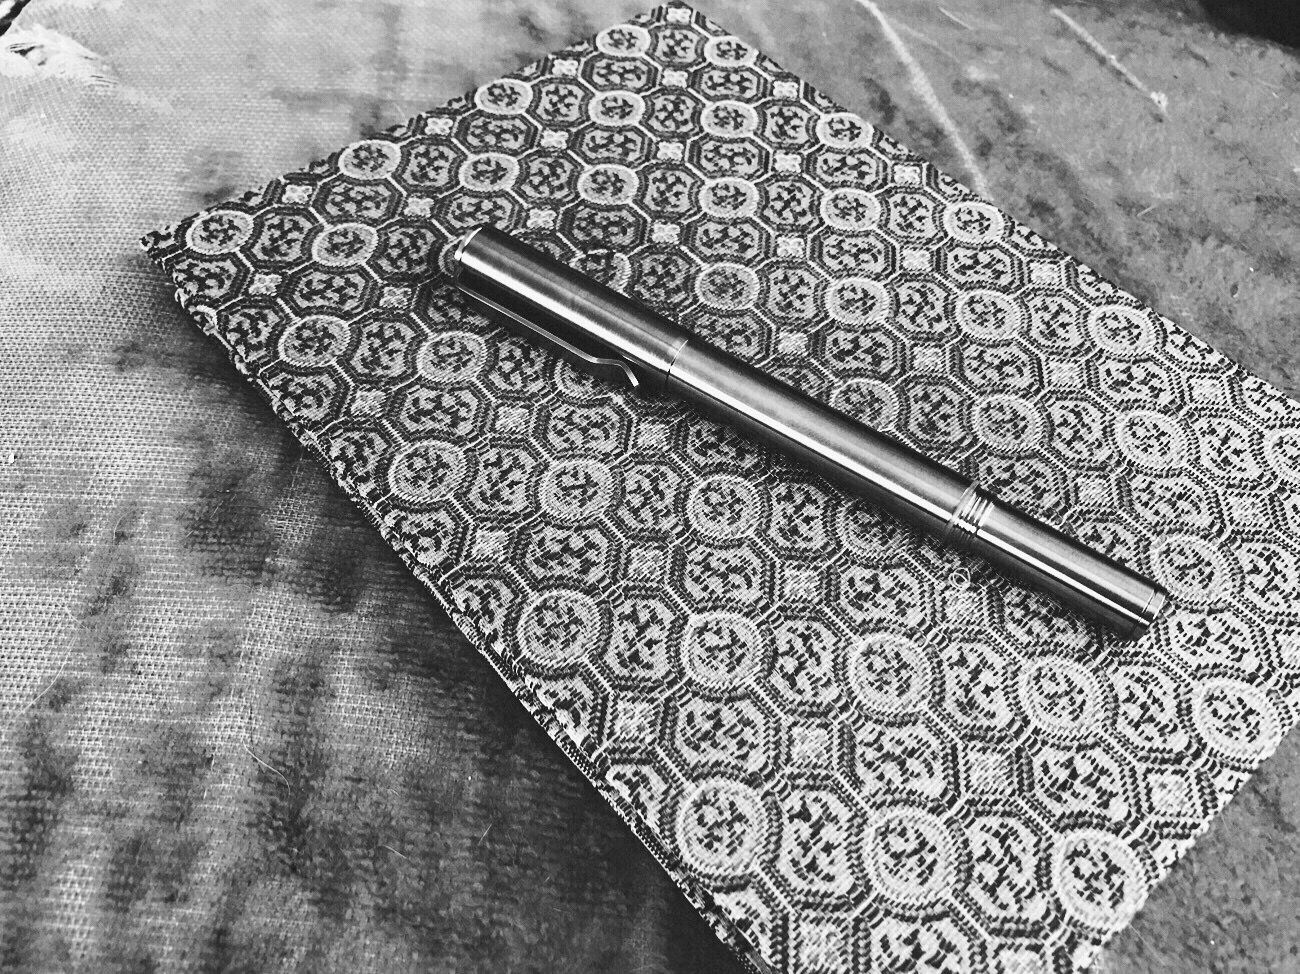 Pattern Feelca_b Koduckgirl Journal Pen Iphone7 Blk N Wht